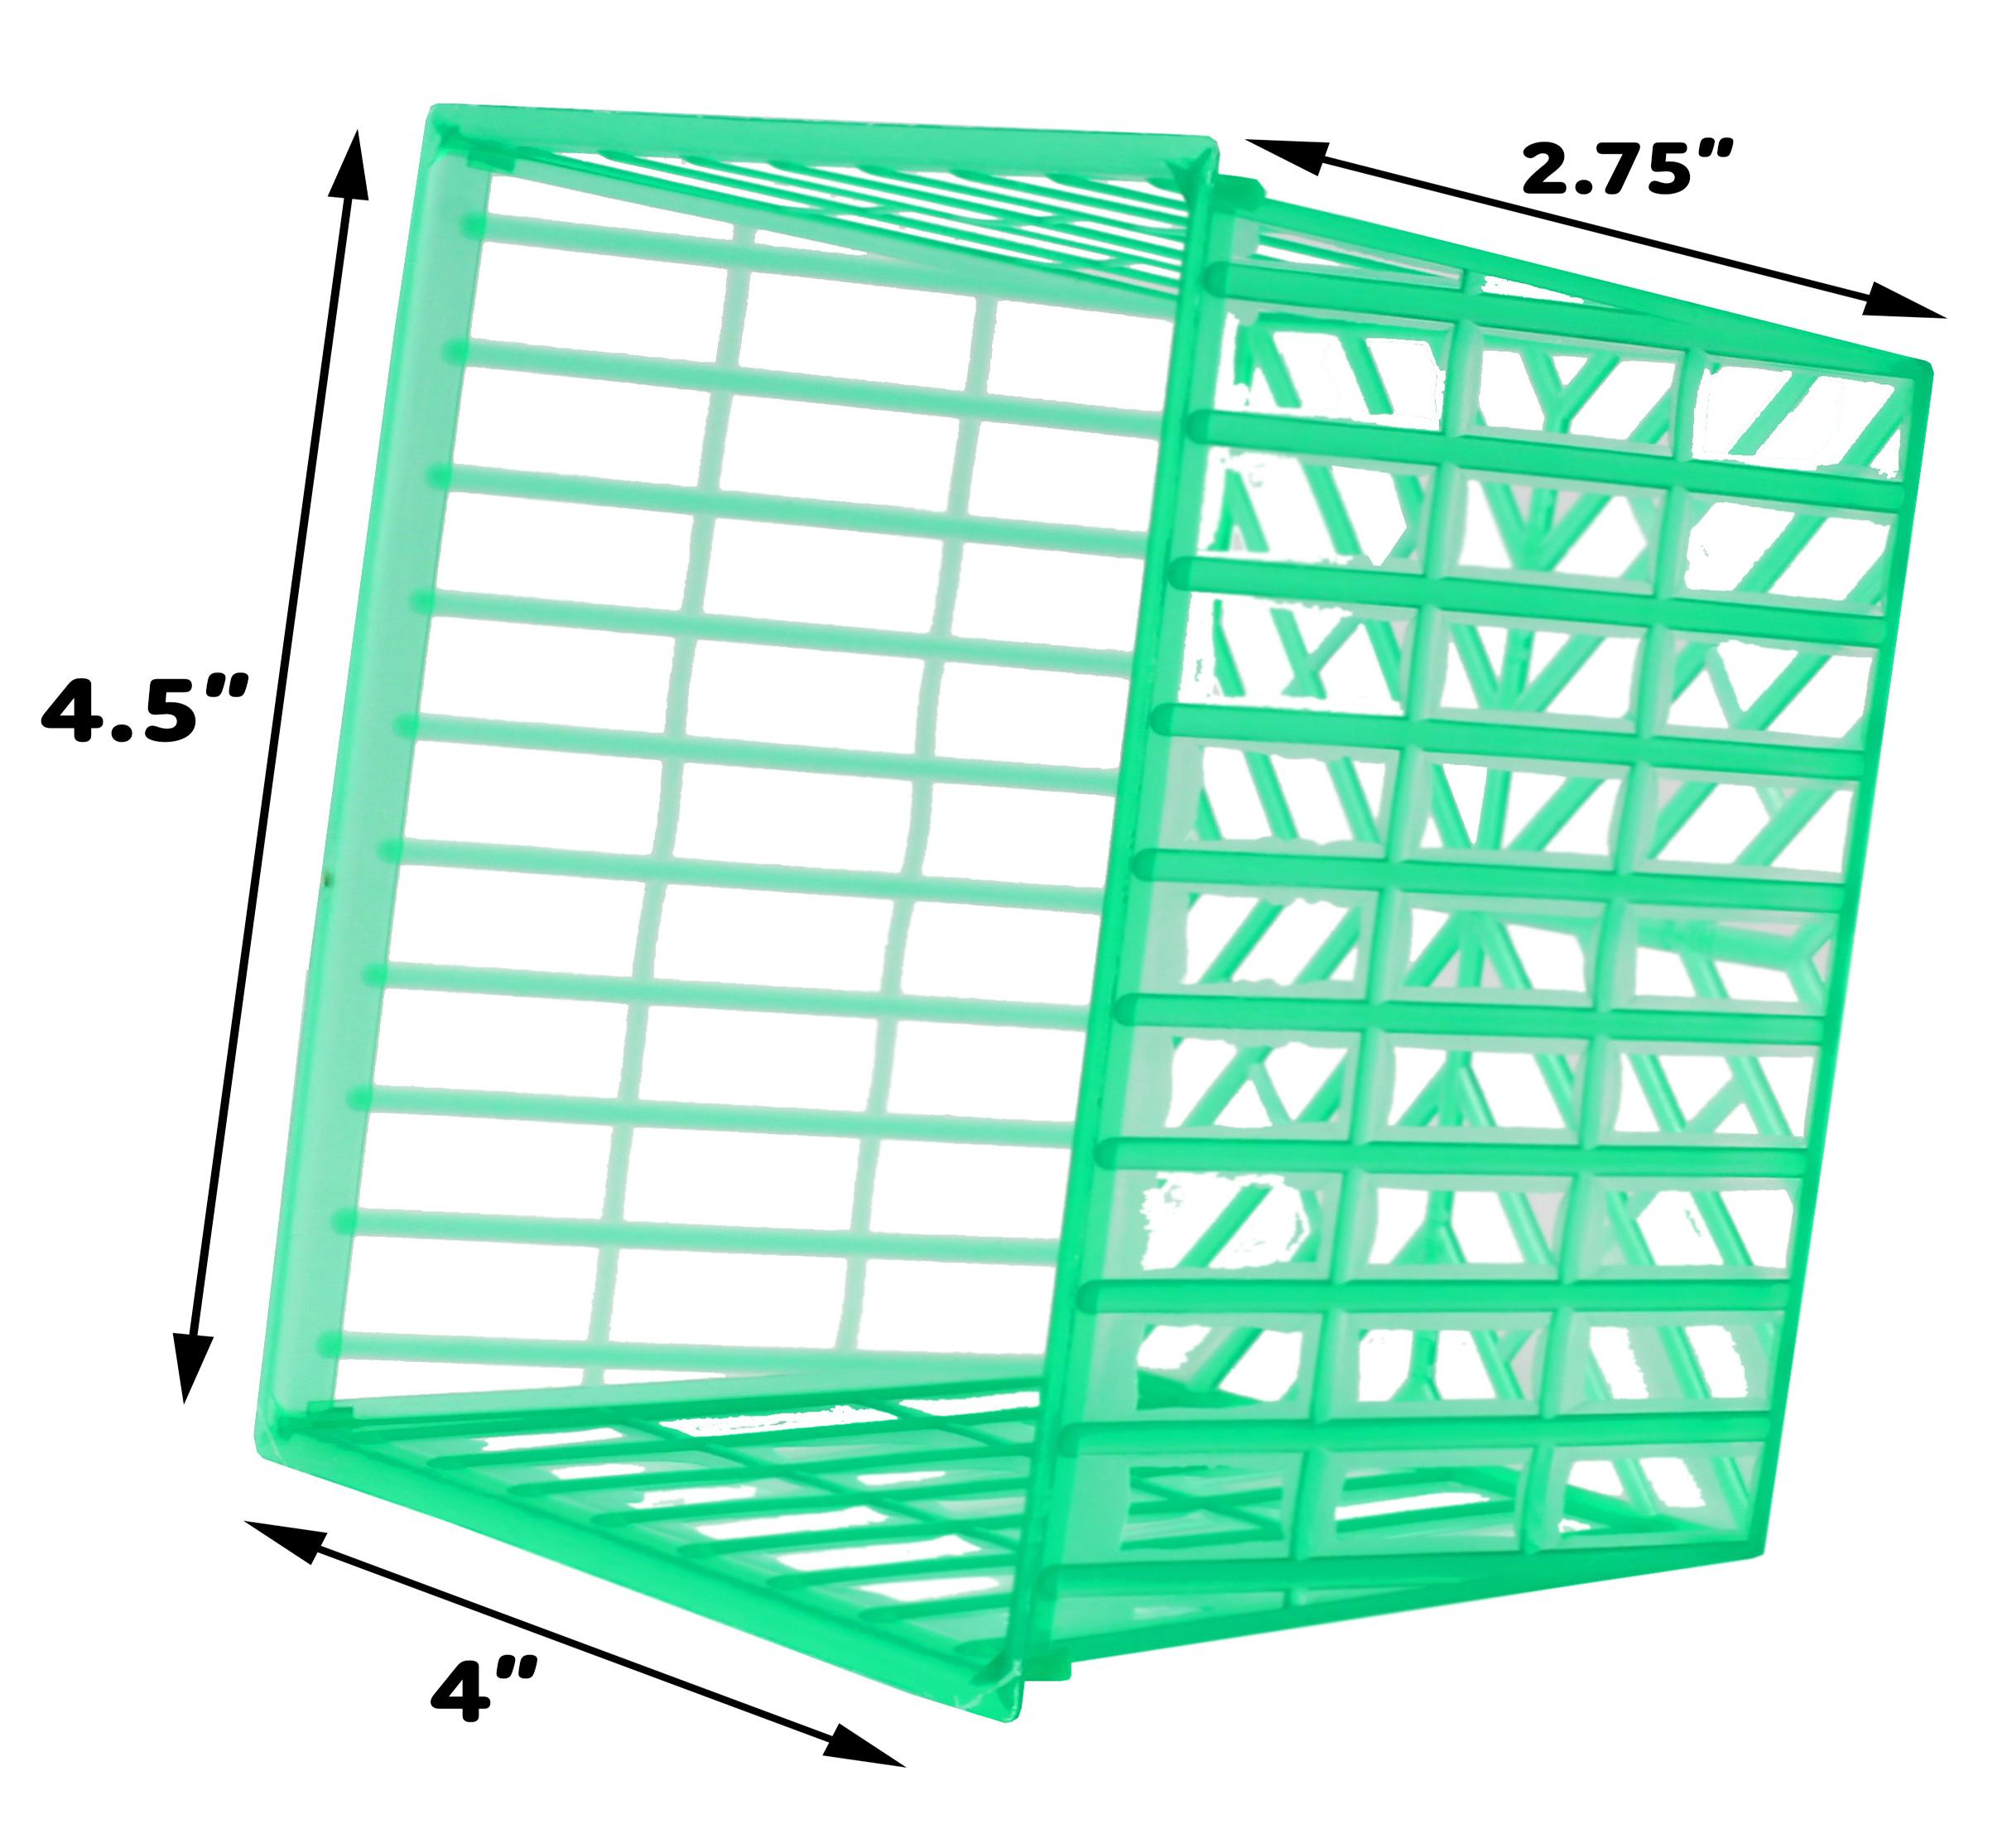 B01FS34G1M - 48-Pack Pint Size Plastic B